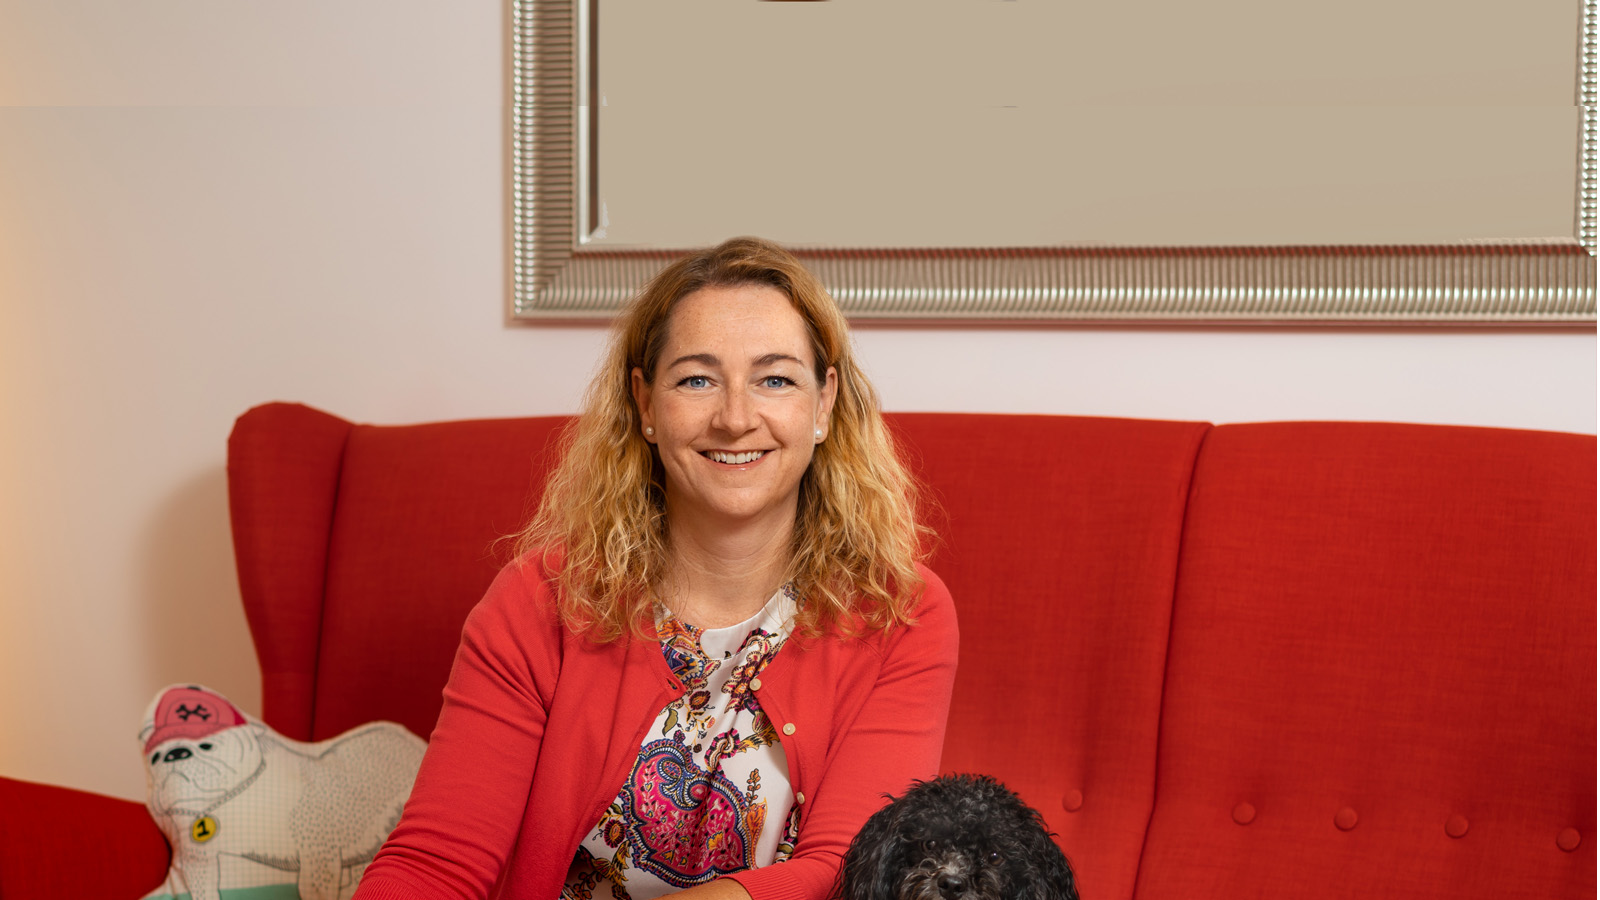 Anita Stadlmann – Lebensziele | story.one